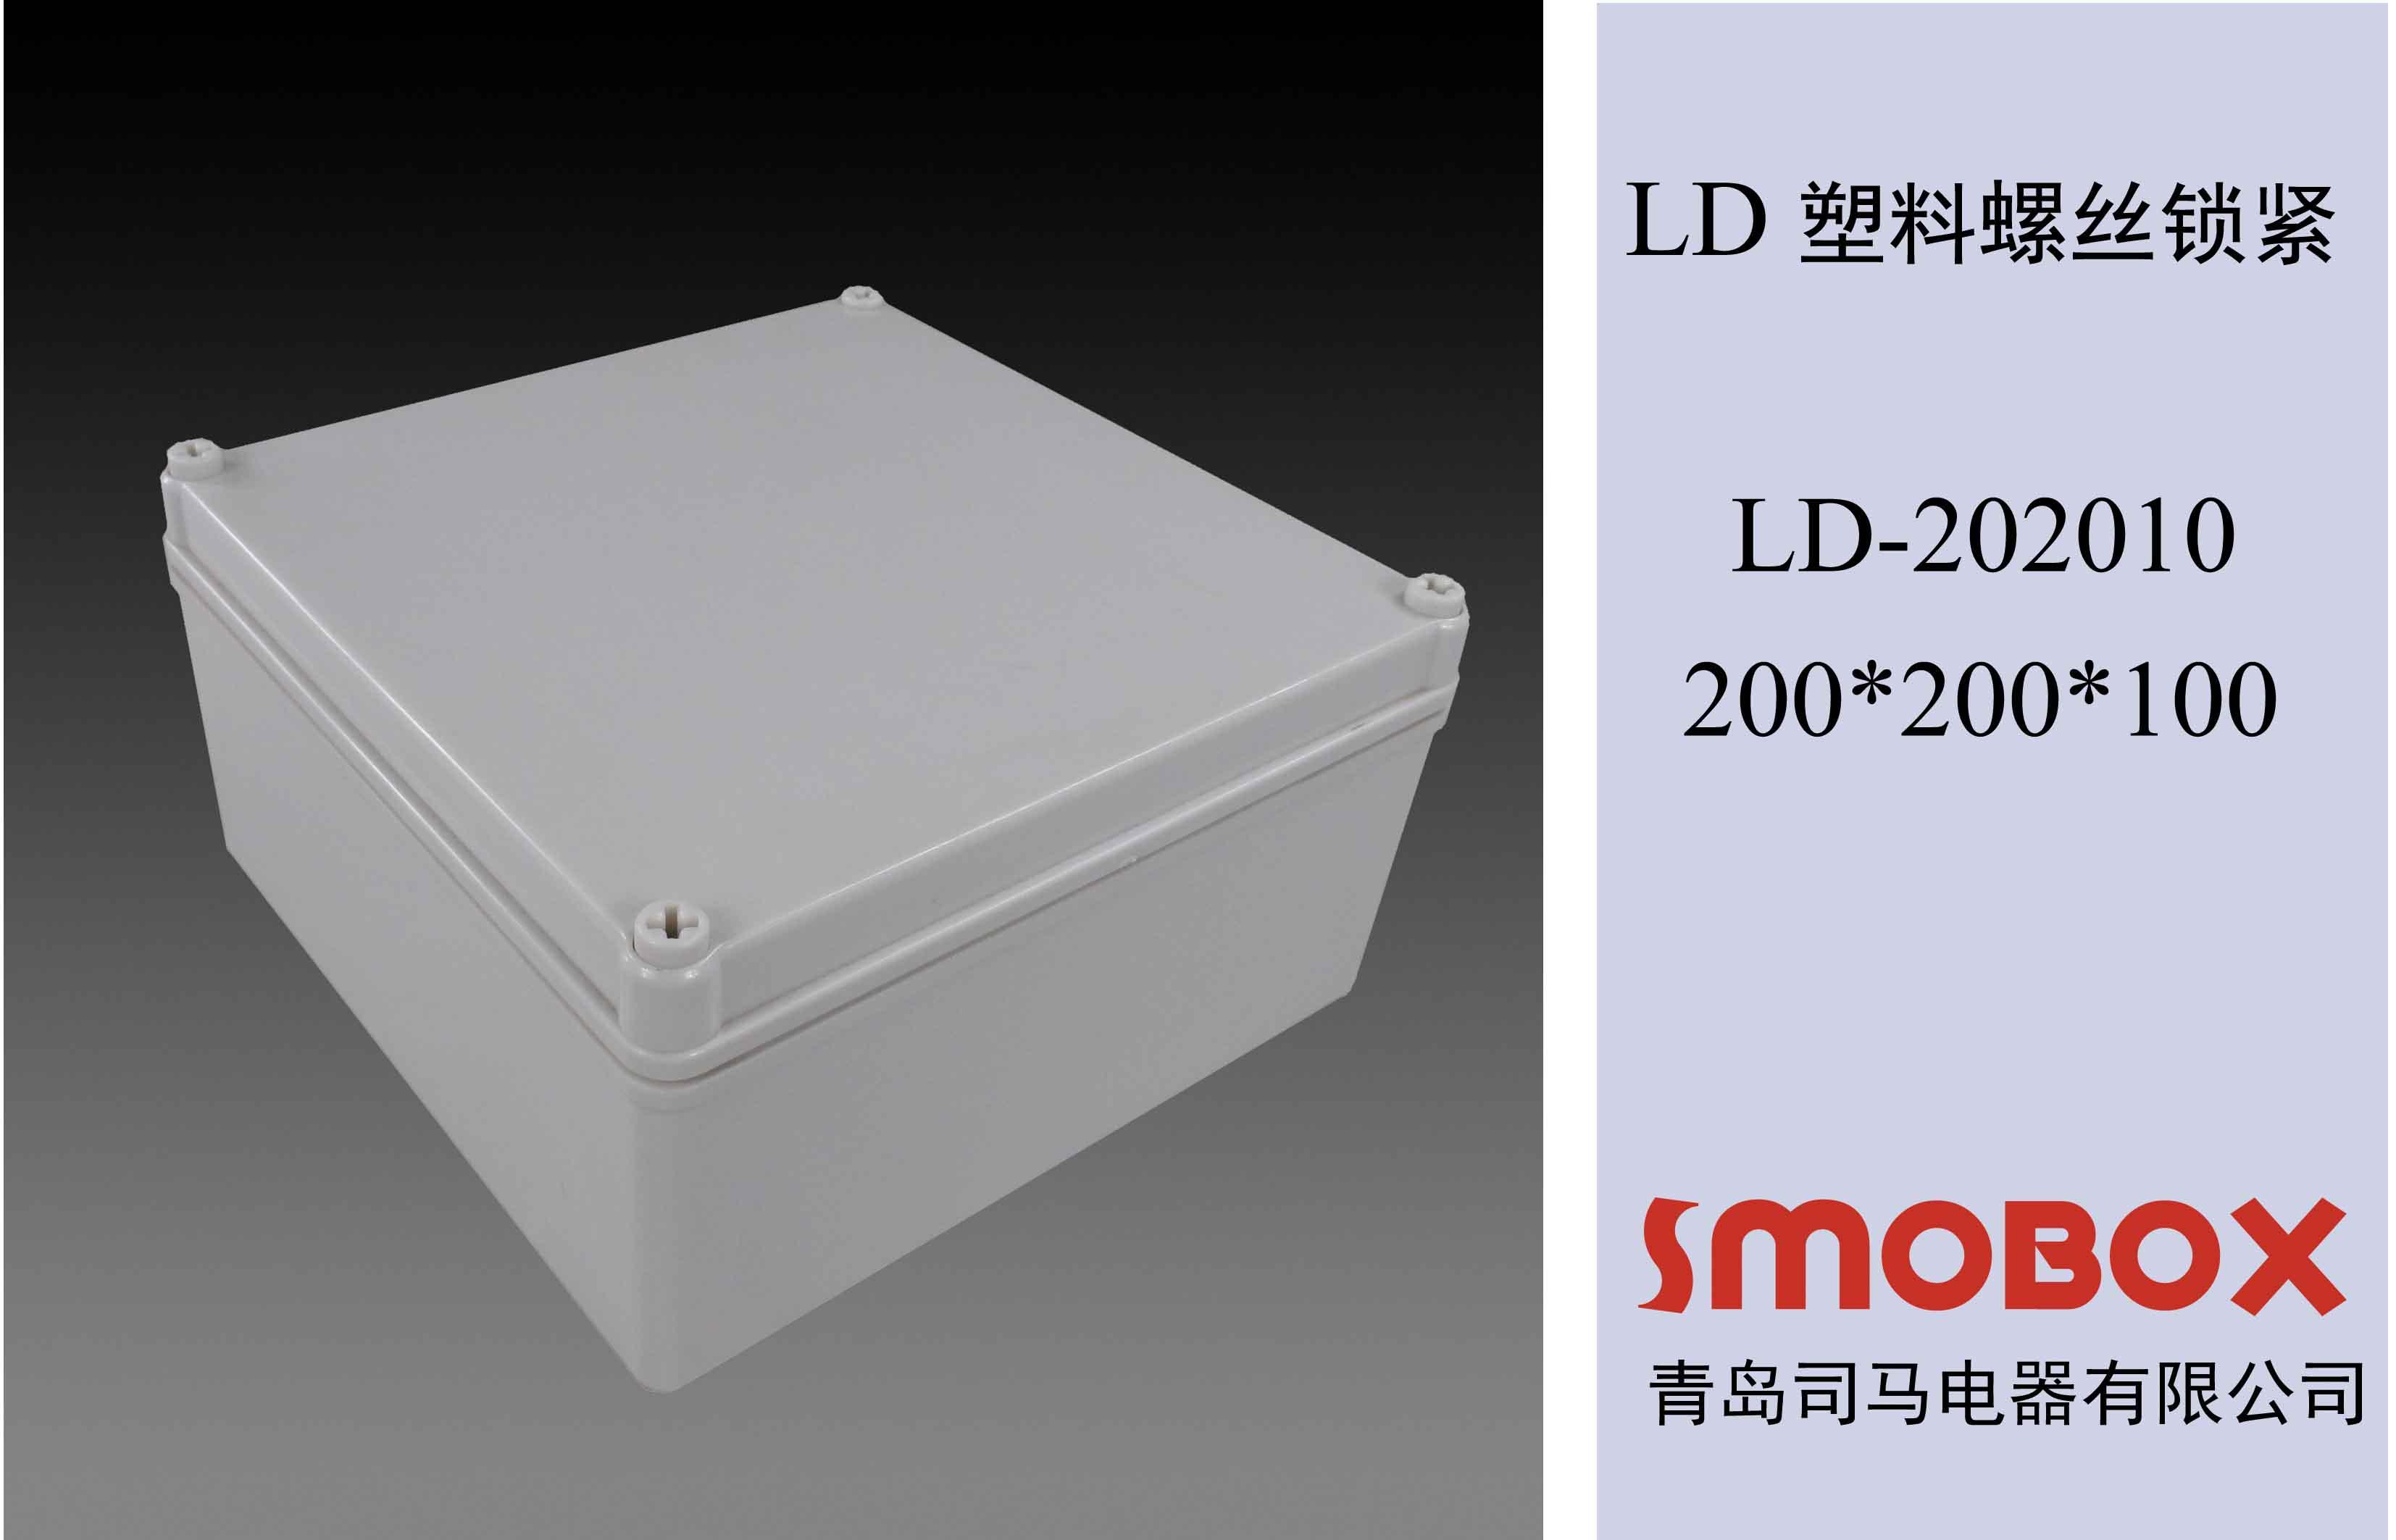 200*200*100ABS塑料箱 阻燃配电箱 耐腐蚀 抗撞击电器防爆配电箱 阻燃接线盒